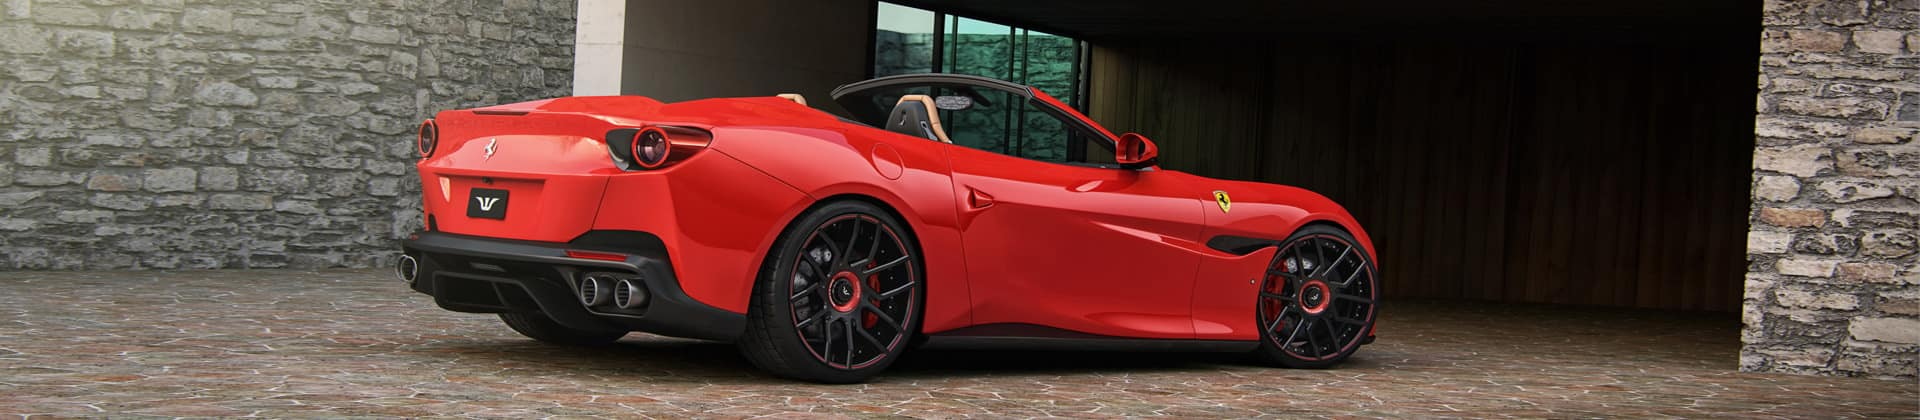 side rear view tuned red portofino wheelsandmore